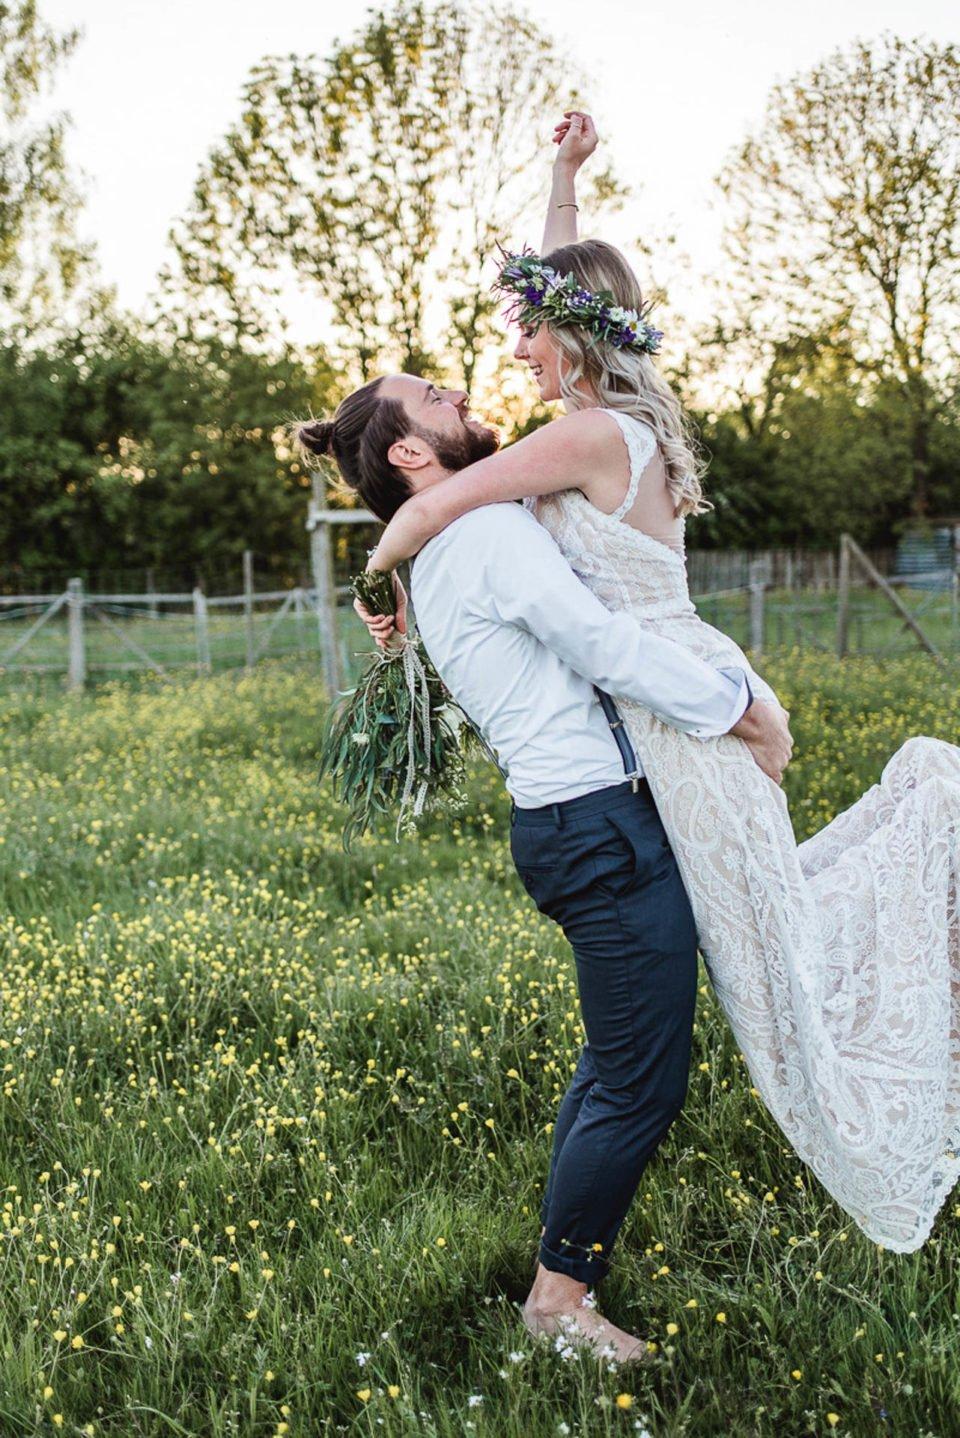 Bräutigam hält strahlende Braut nach oben